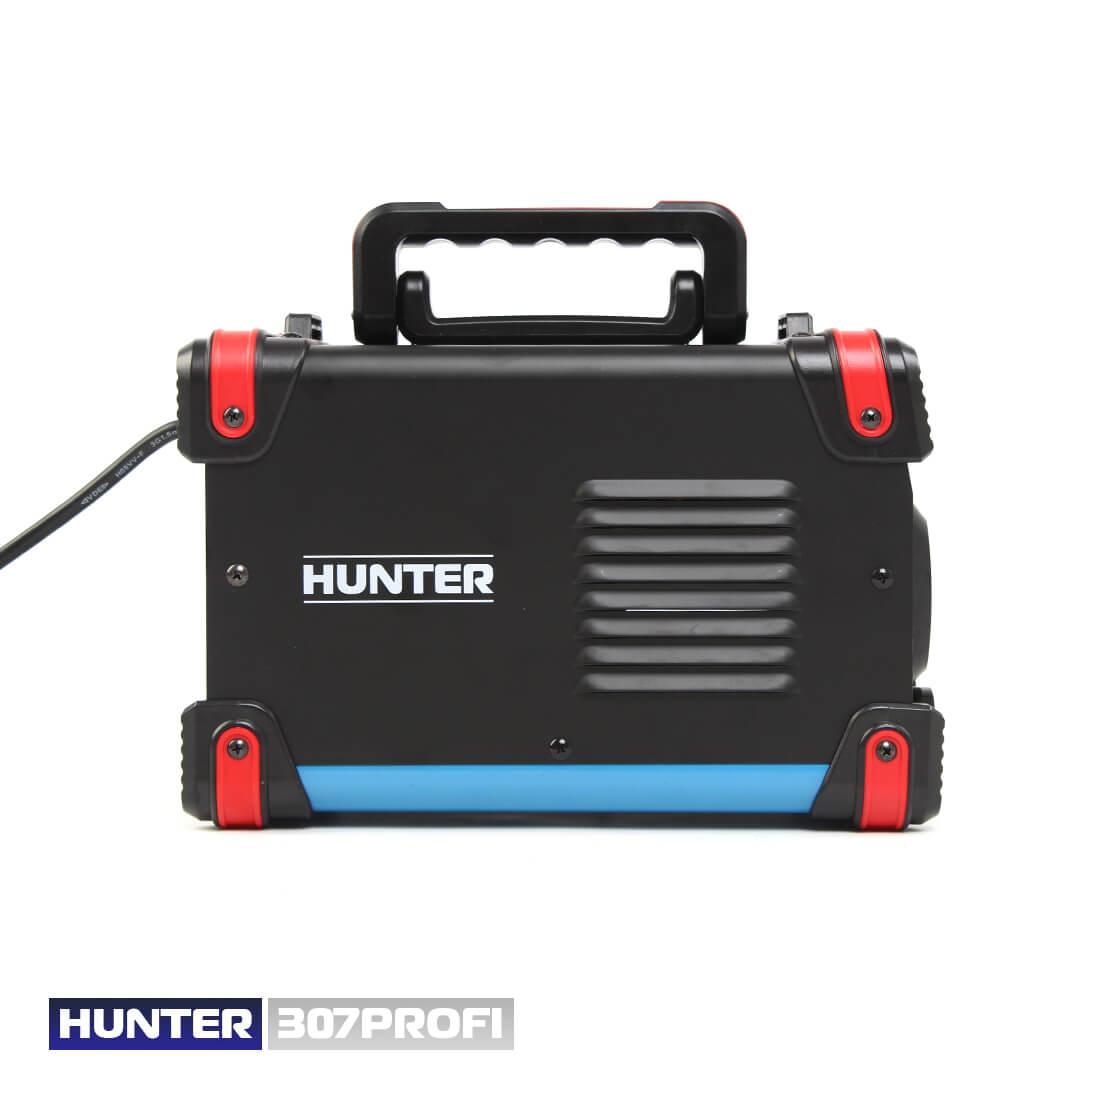 Фото Hunter MMA 307 PROFI (дуговая) цена 3150грн №3 — Hunter